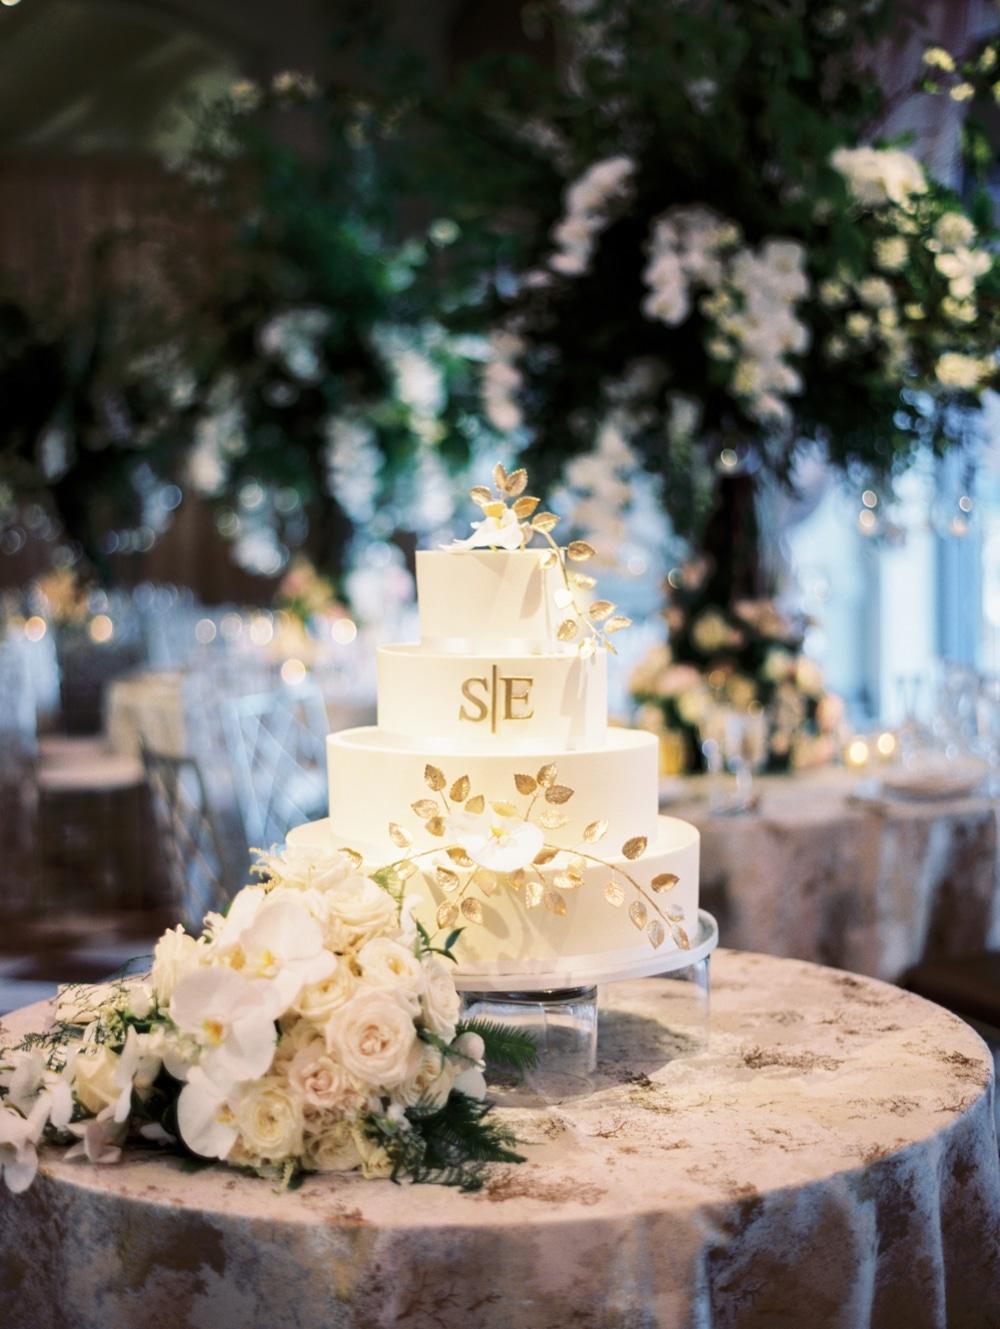 kristin-la-voie-photography-Cincinnati-Music-Hall-Wedding-265